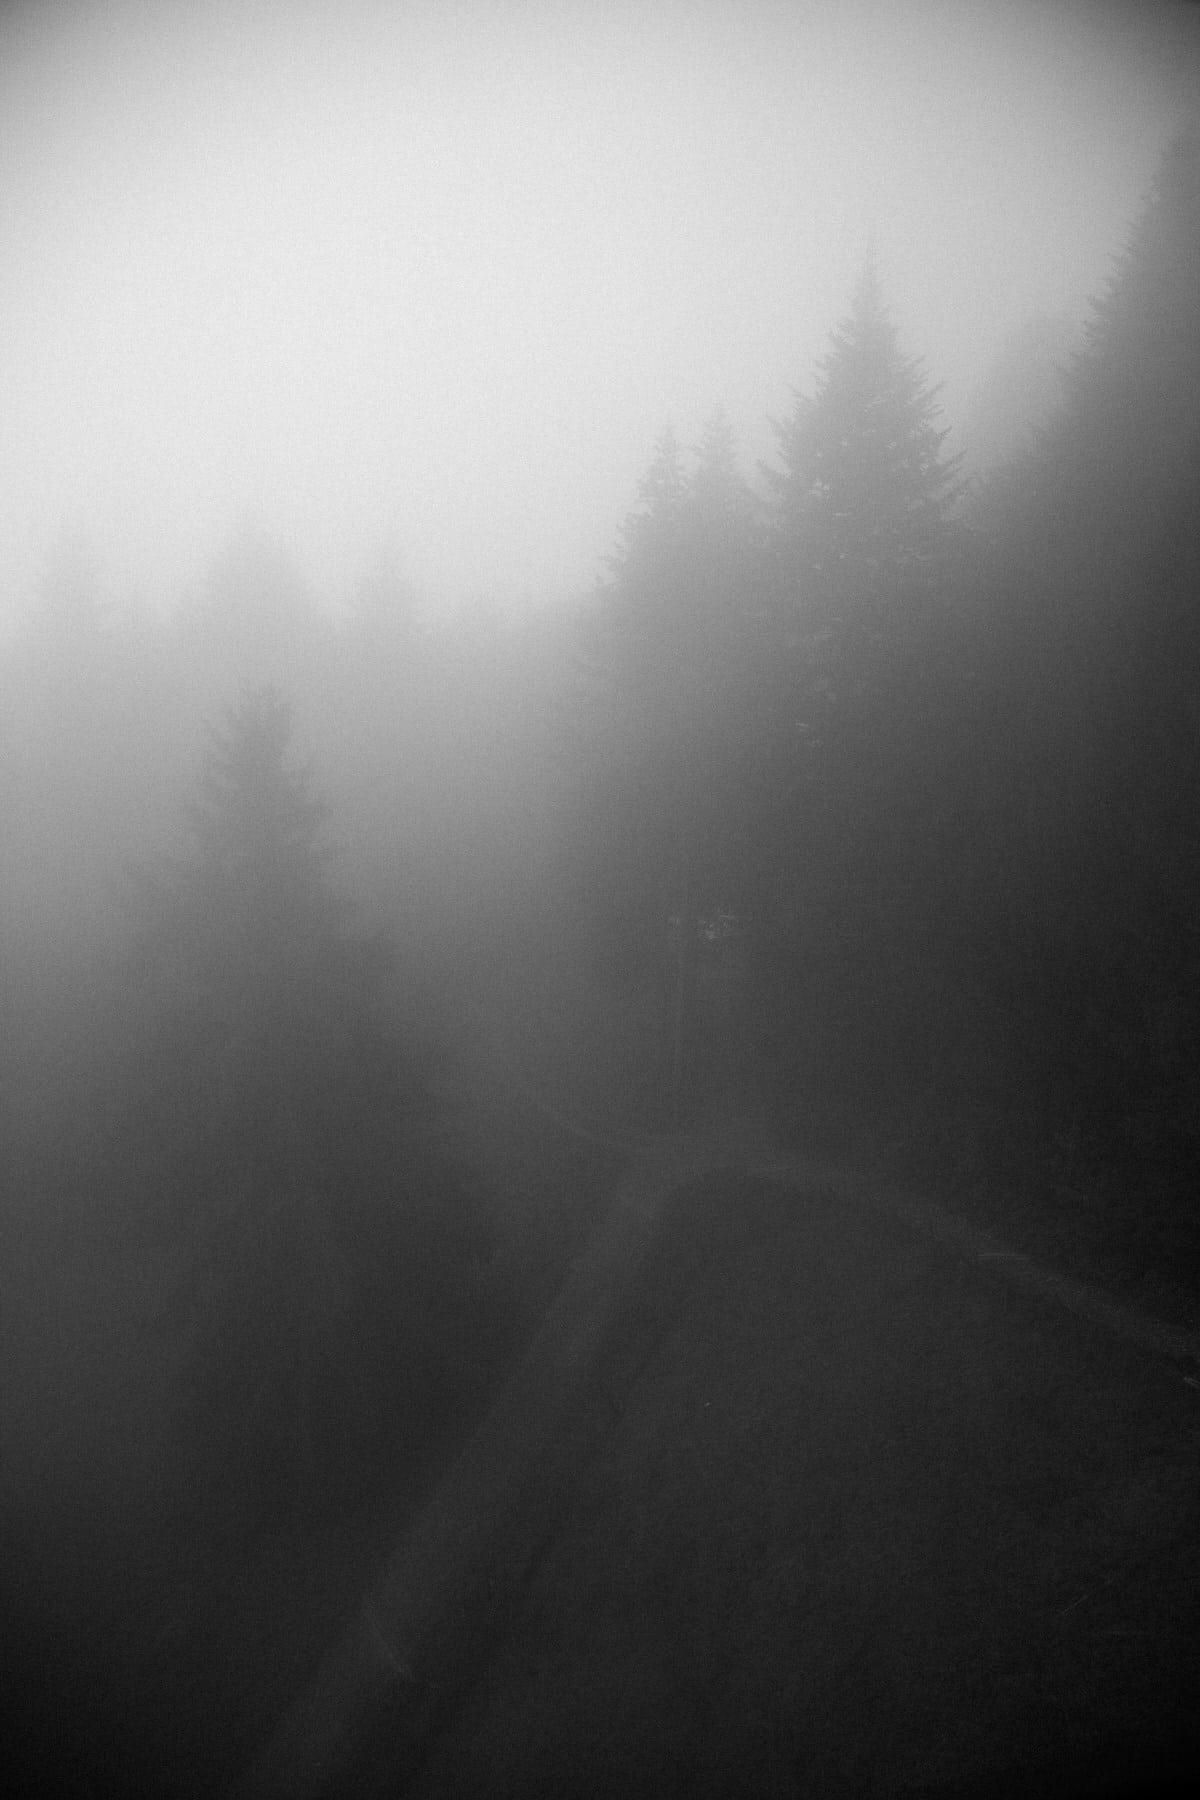 Mount_Pilatus_Lucerne_Switzerland-black-and-white-fine-art-photography-by-Studio-L-photographer-Laura-Schneider-_4418